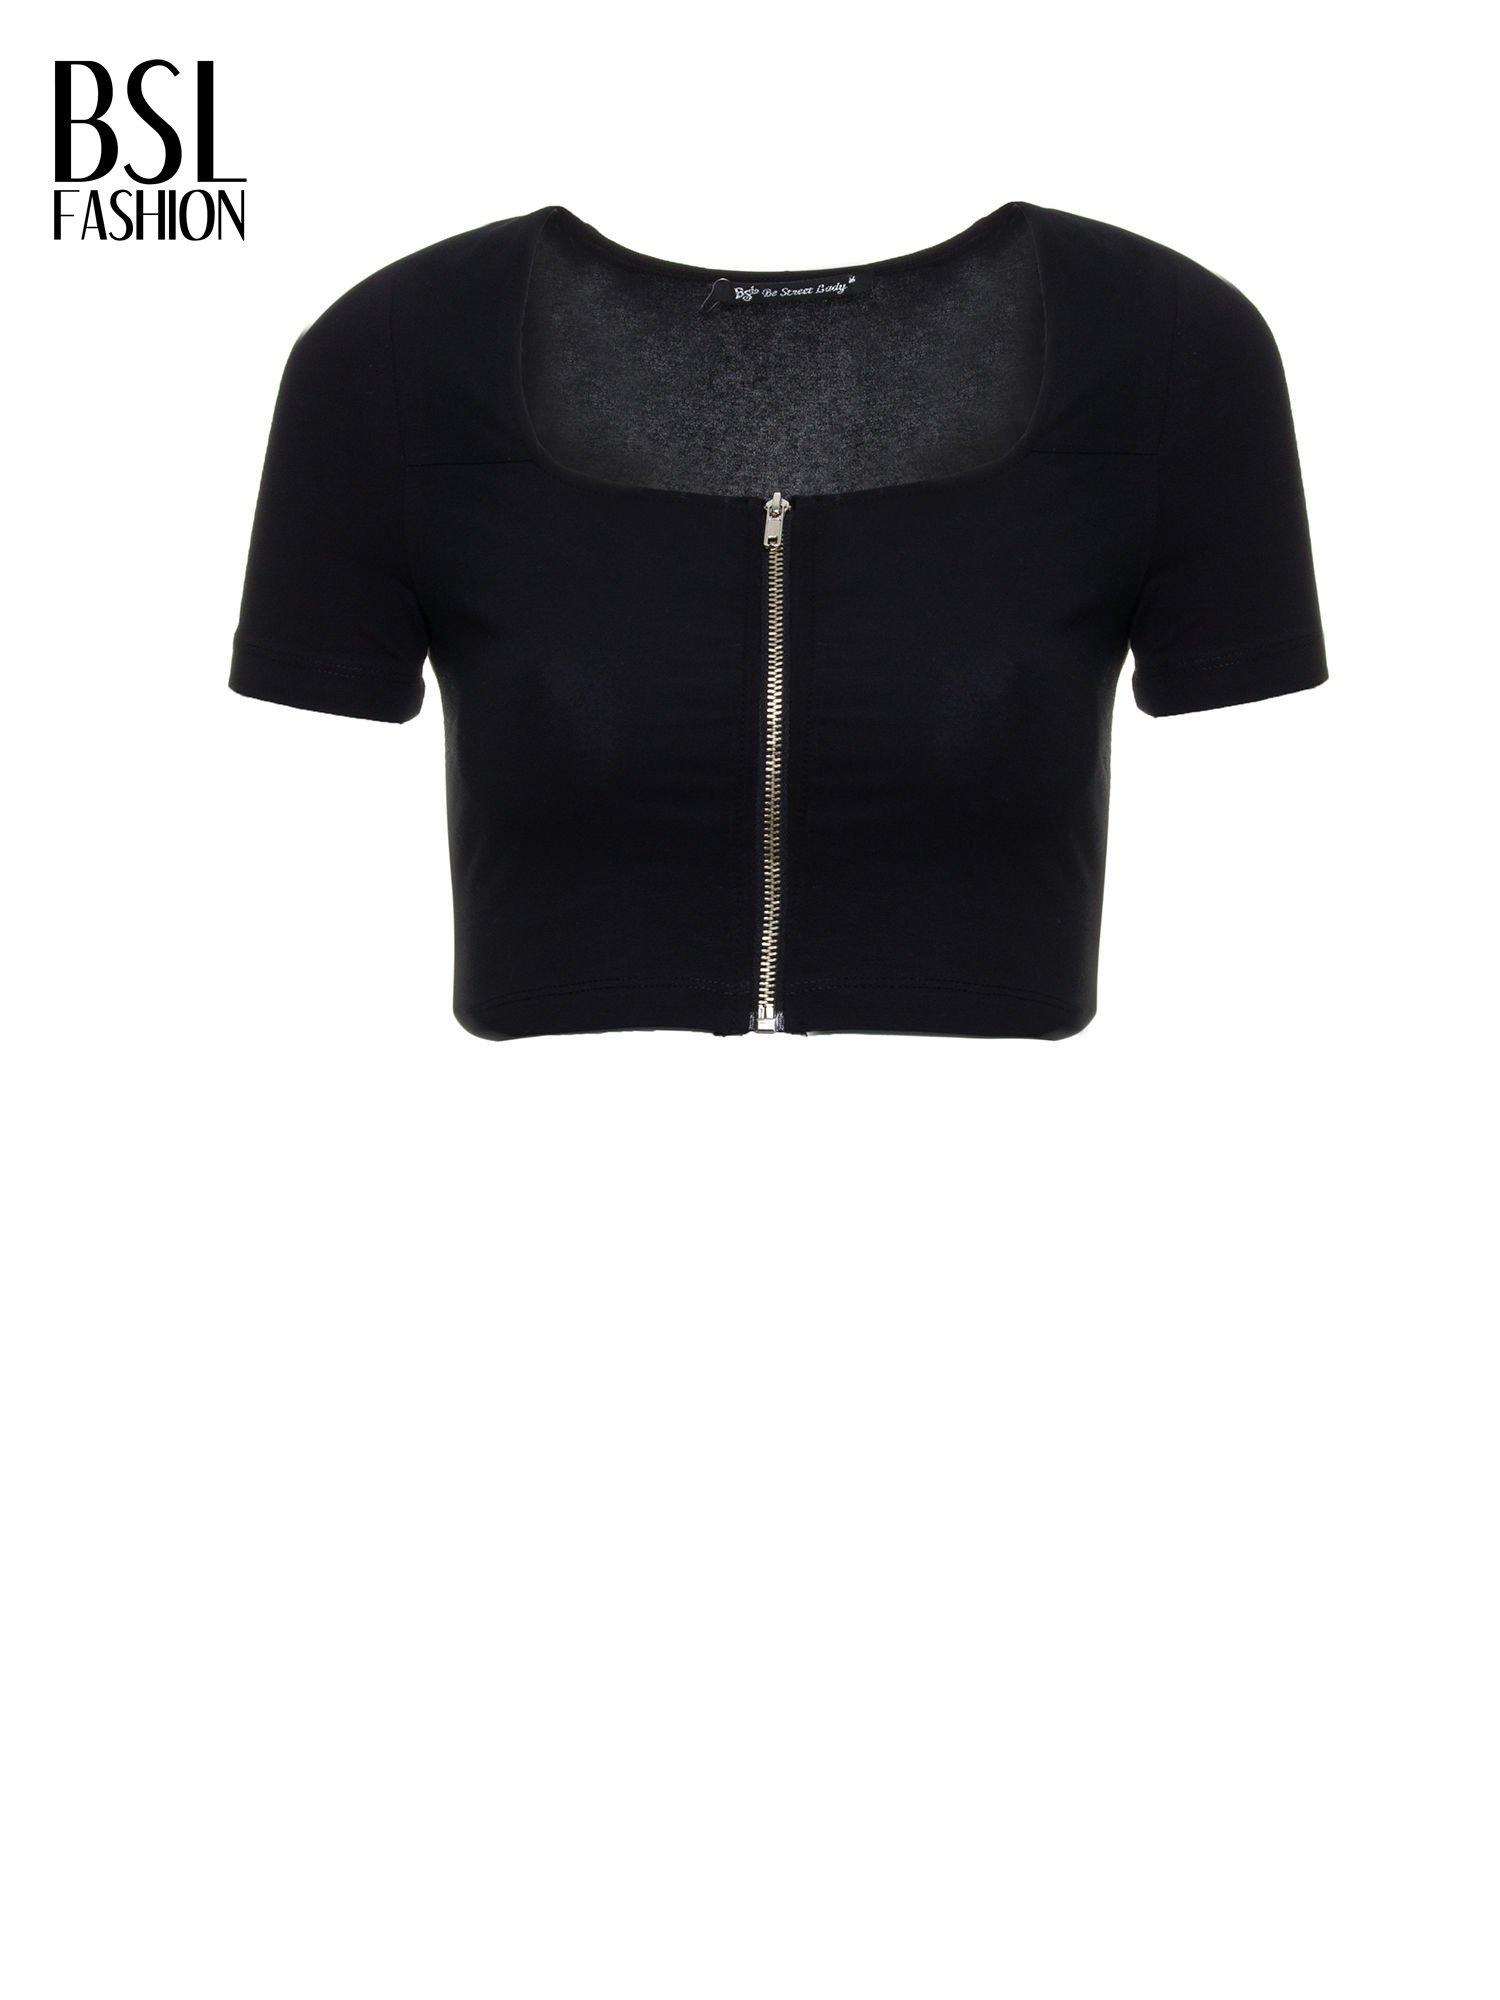 b35232ca01d3 Czarny crop top z zamkiem z przodu - T-shirt top - sklep eButik.pl